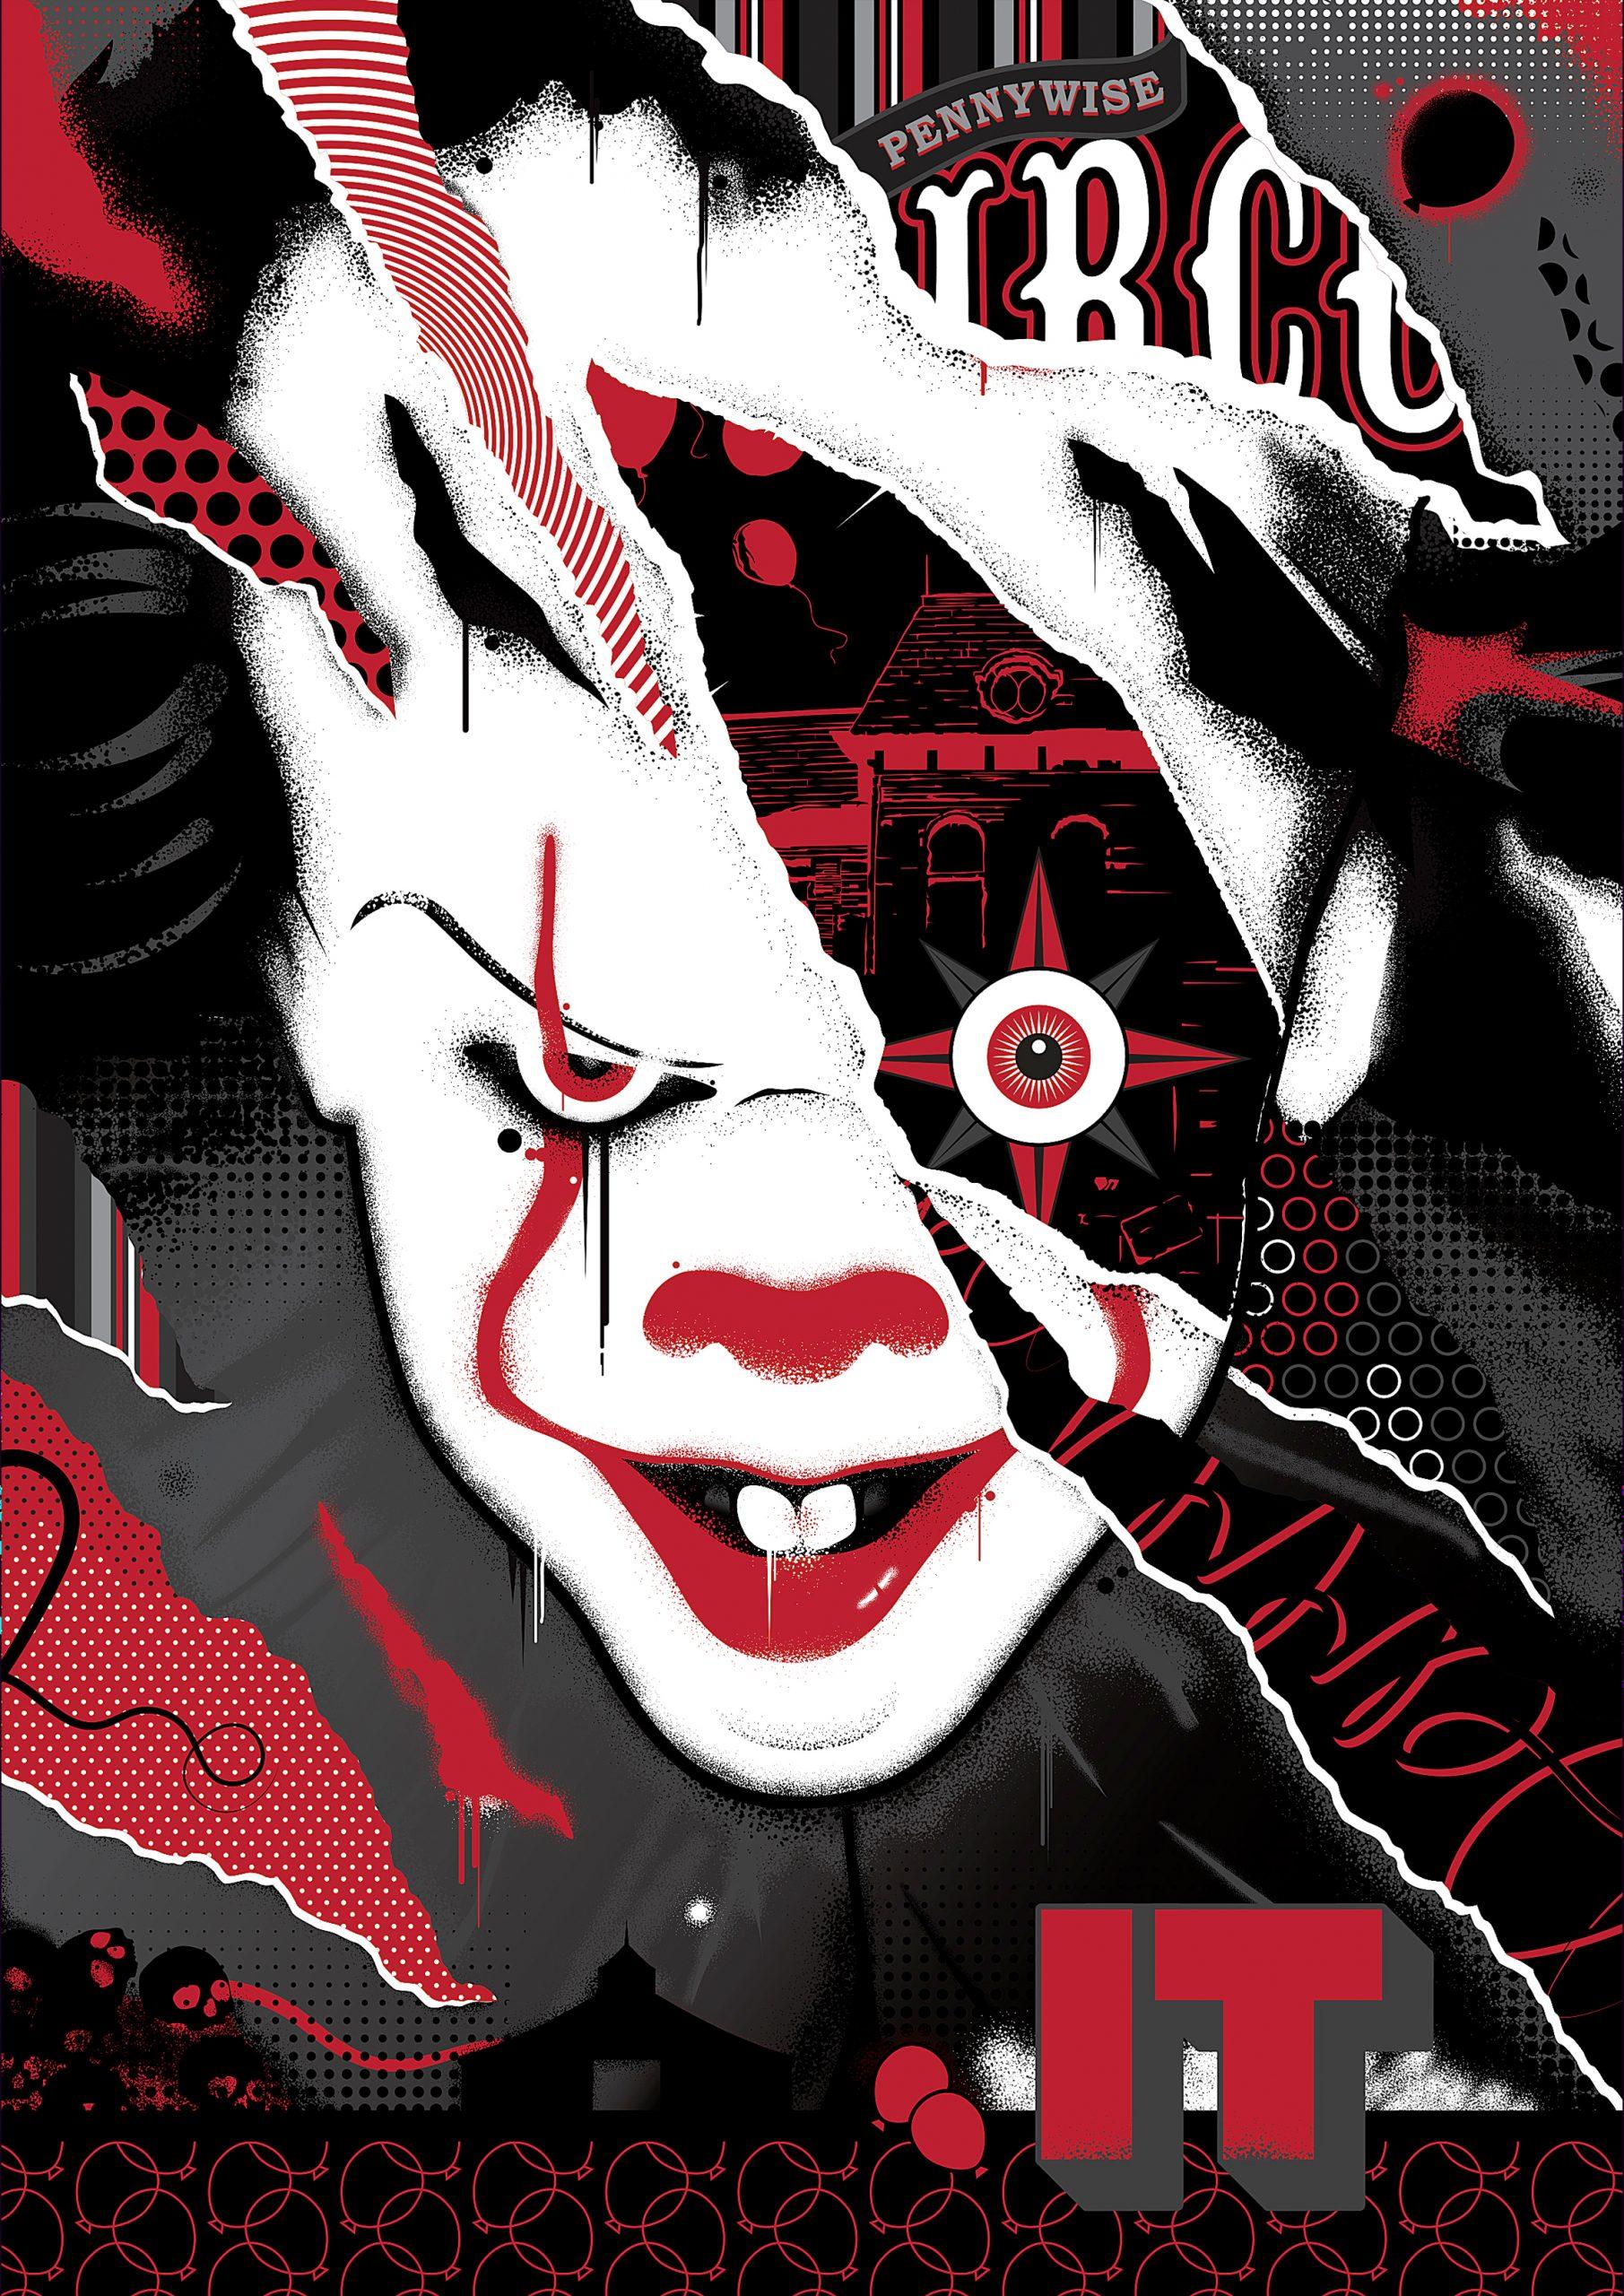 It: Alternative movie poster